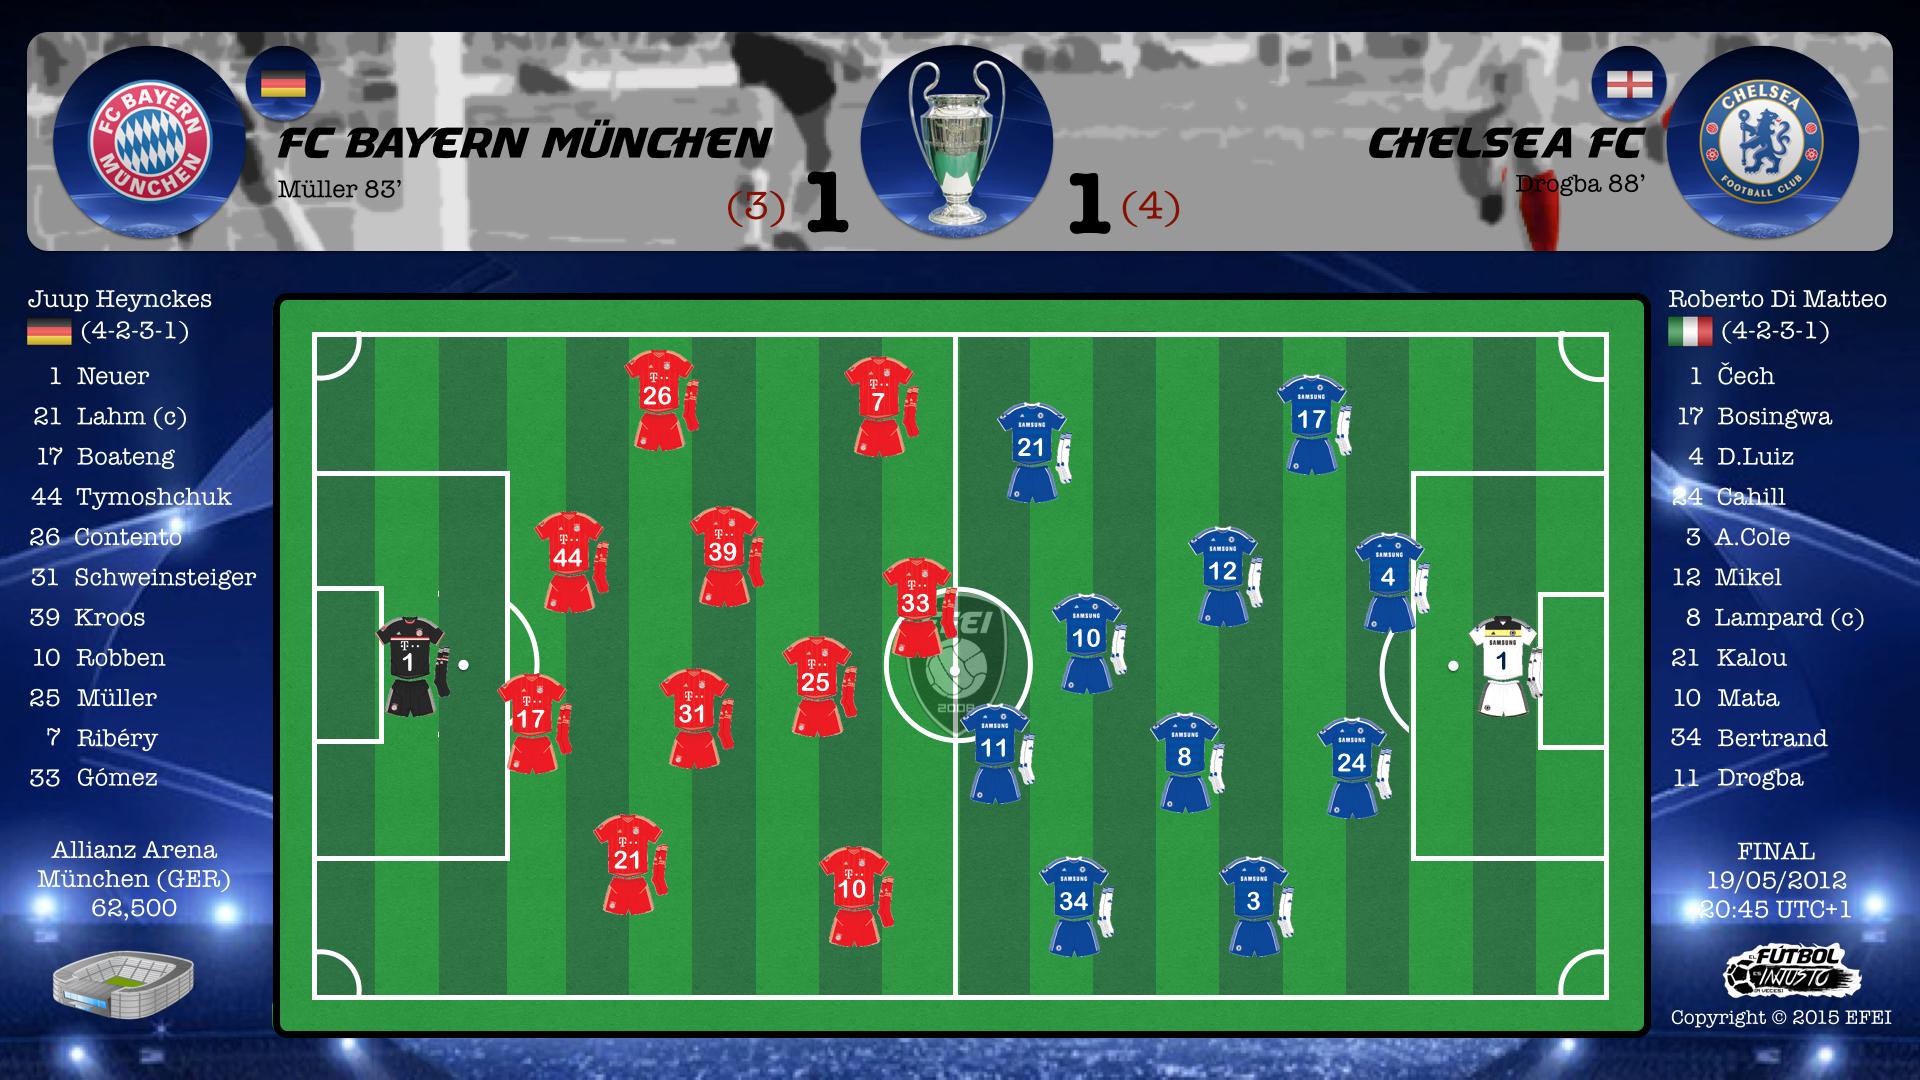 UEFA Champions League Final 2012 Bayern München Chelsea